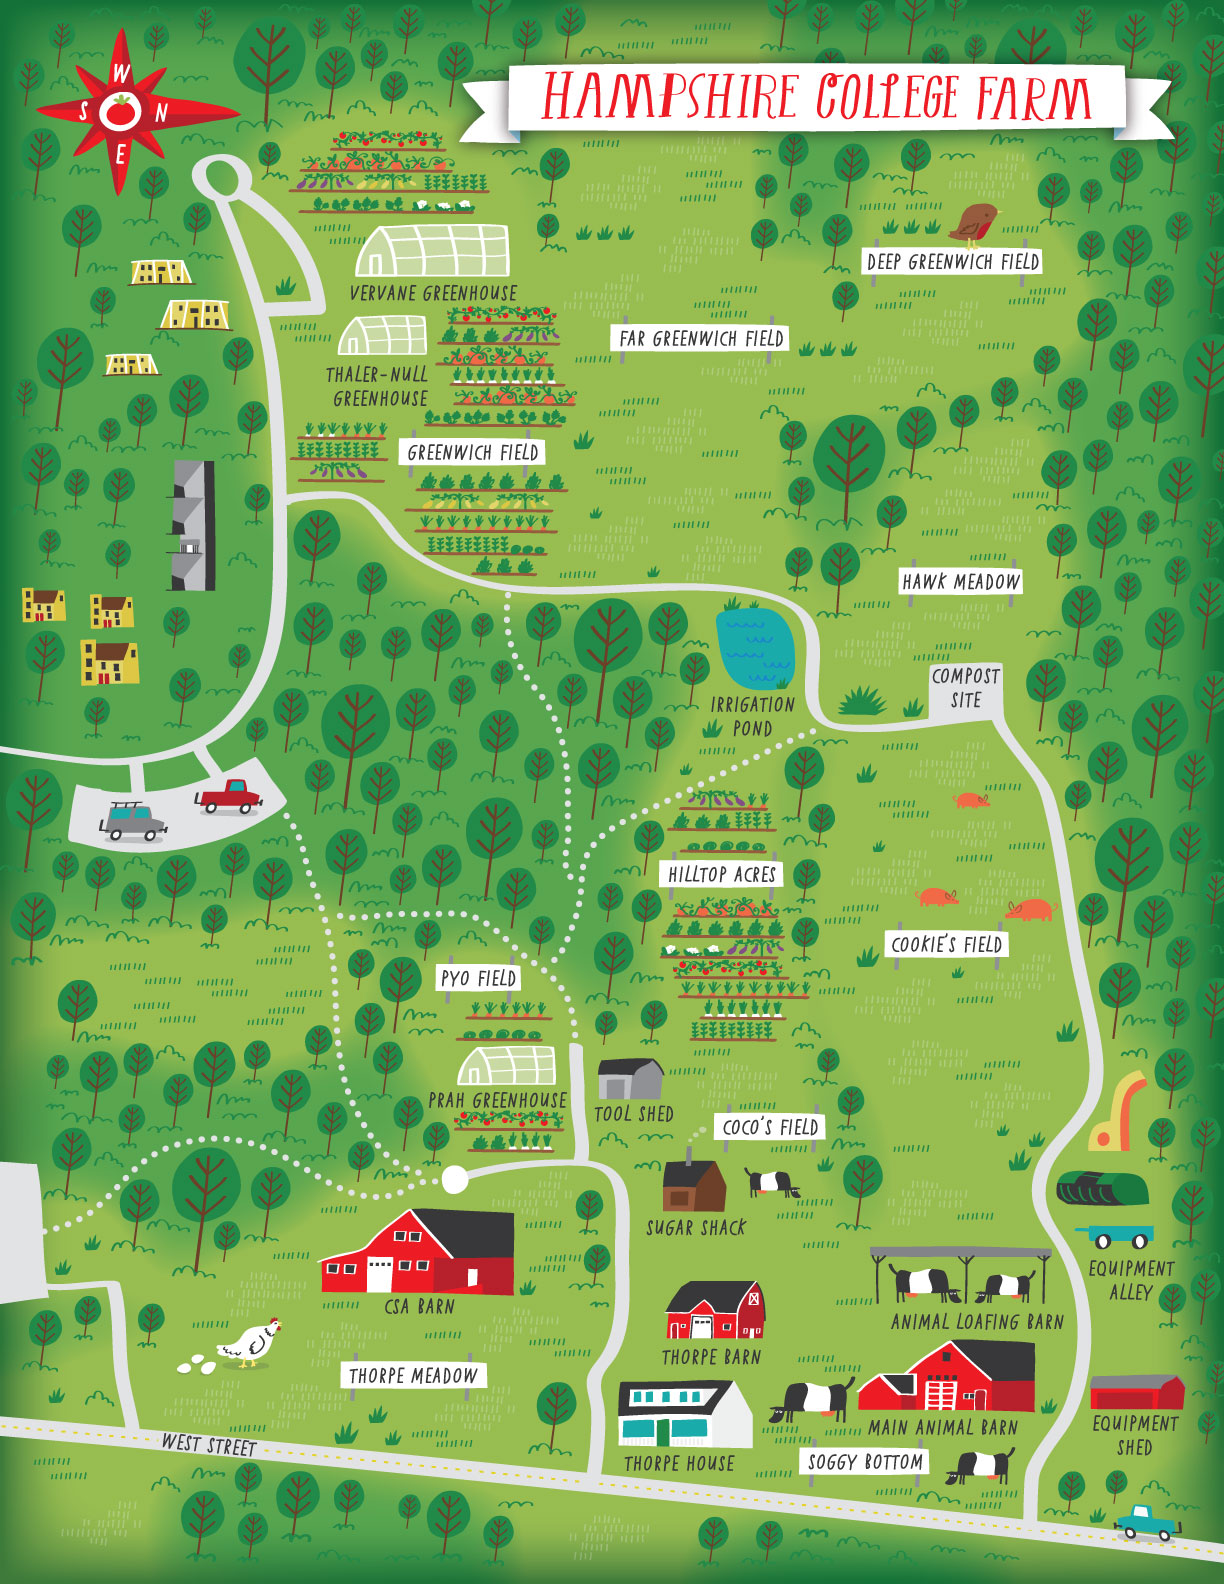 Illustrated campus map of Hampshire college farm